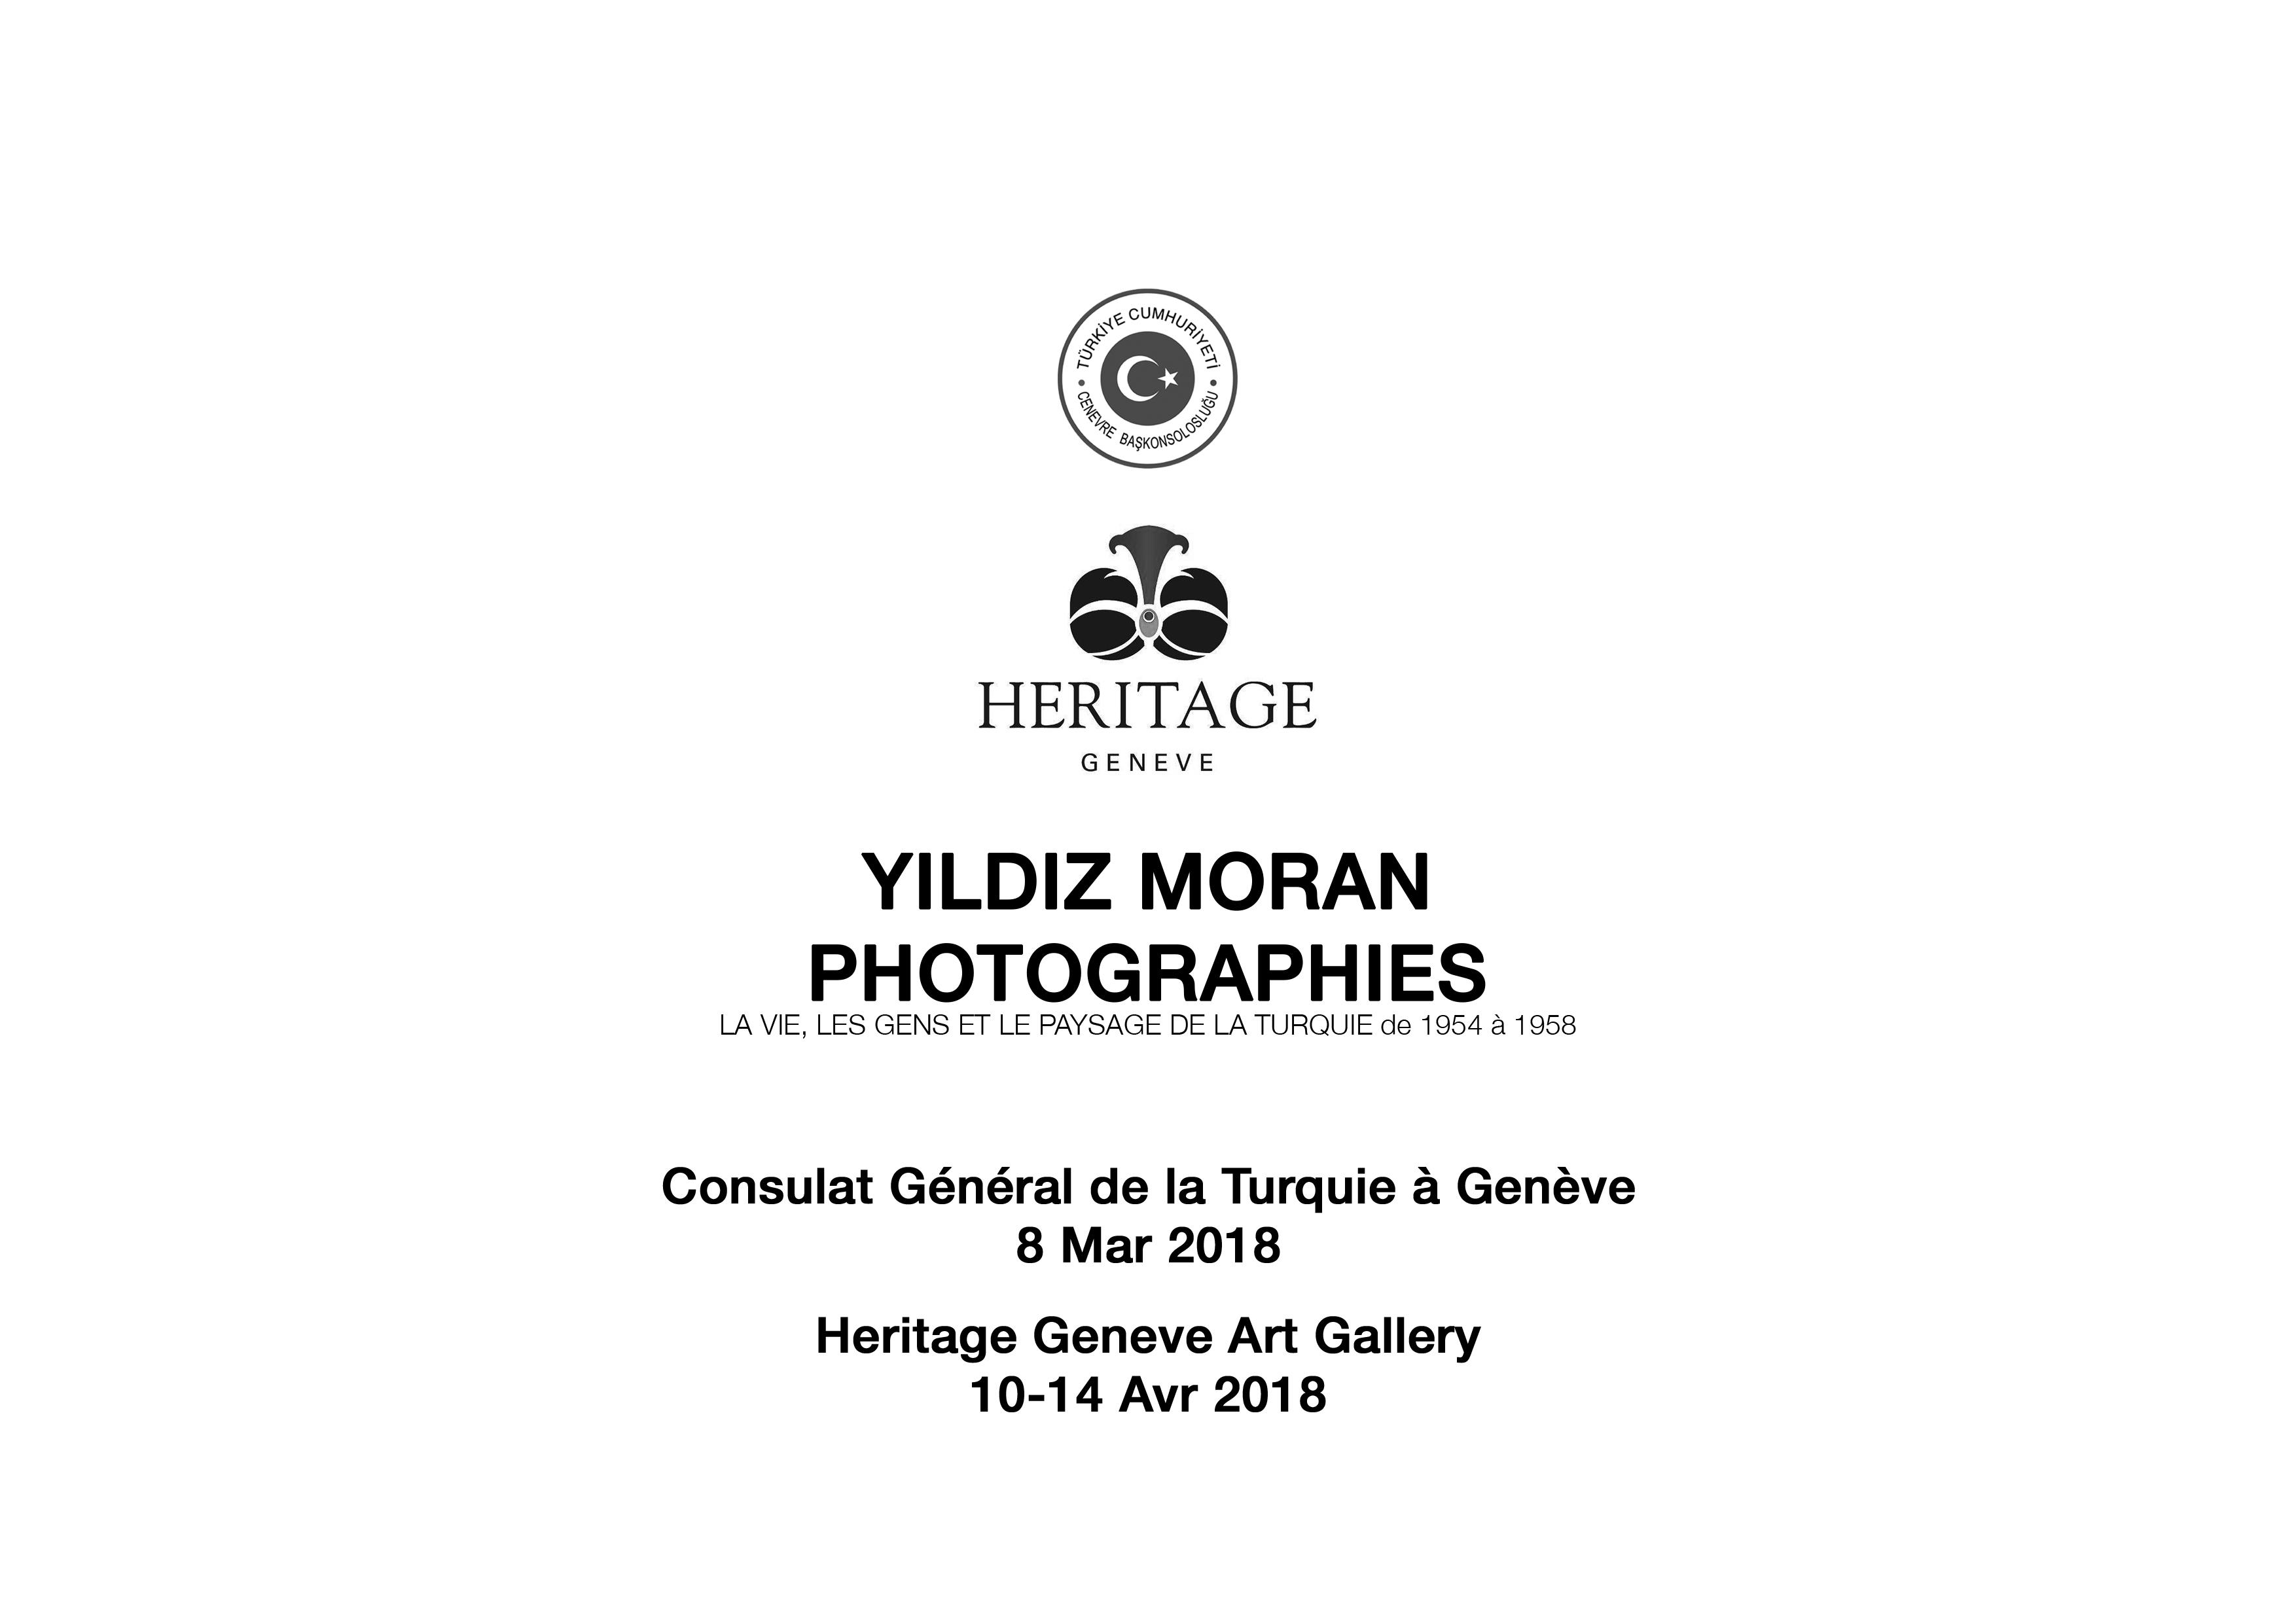 YILDIZ MORAN PHOTOGRAPHIES